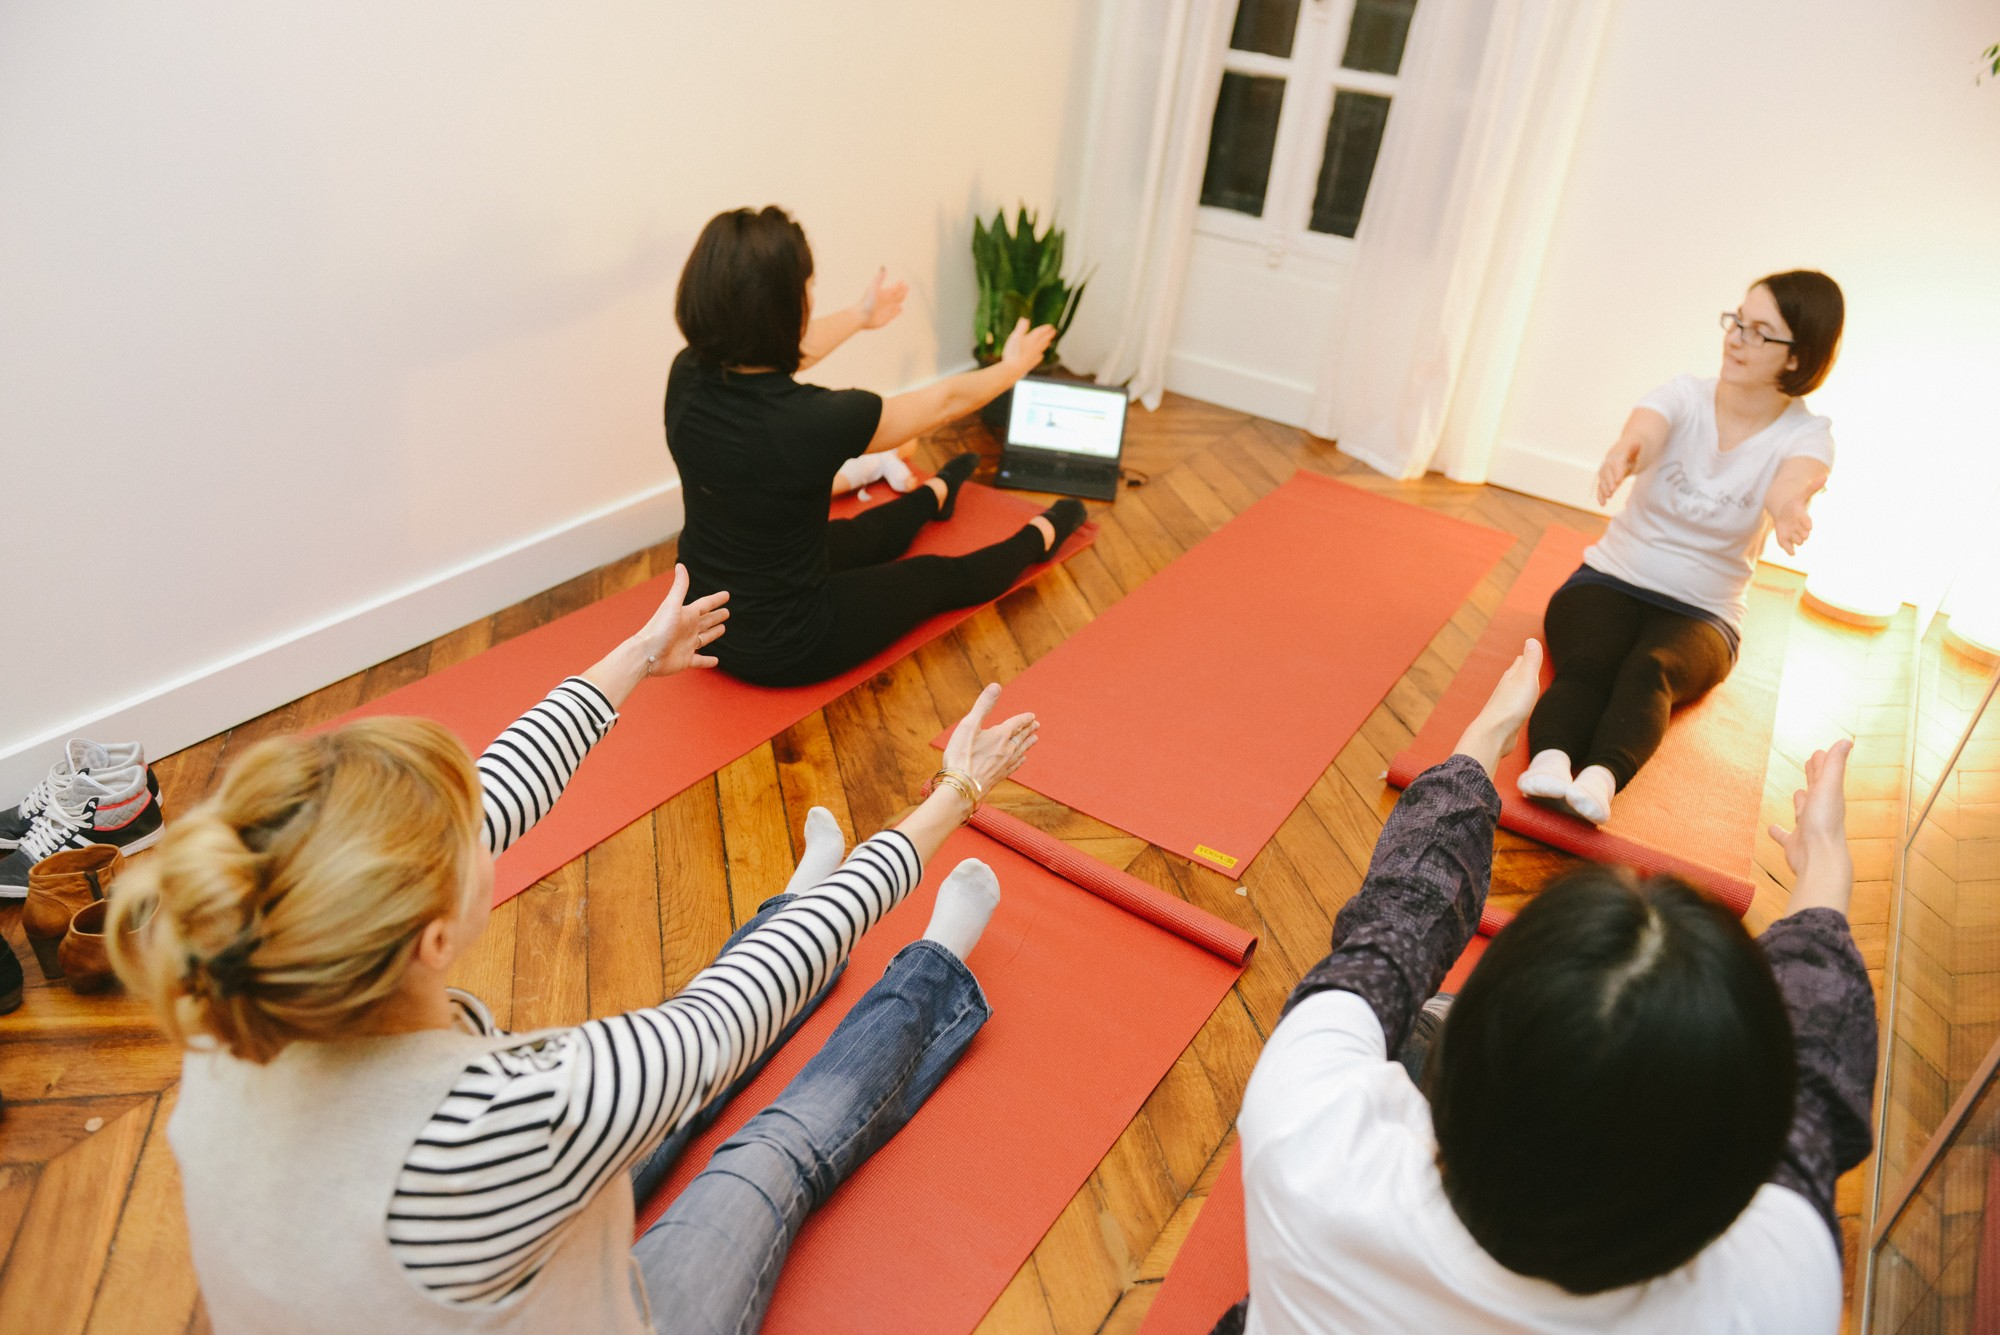 5ans-MTBP-Yoga-candice-henin-BD-500